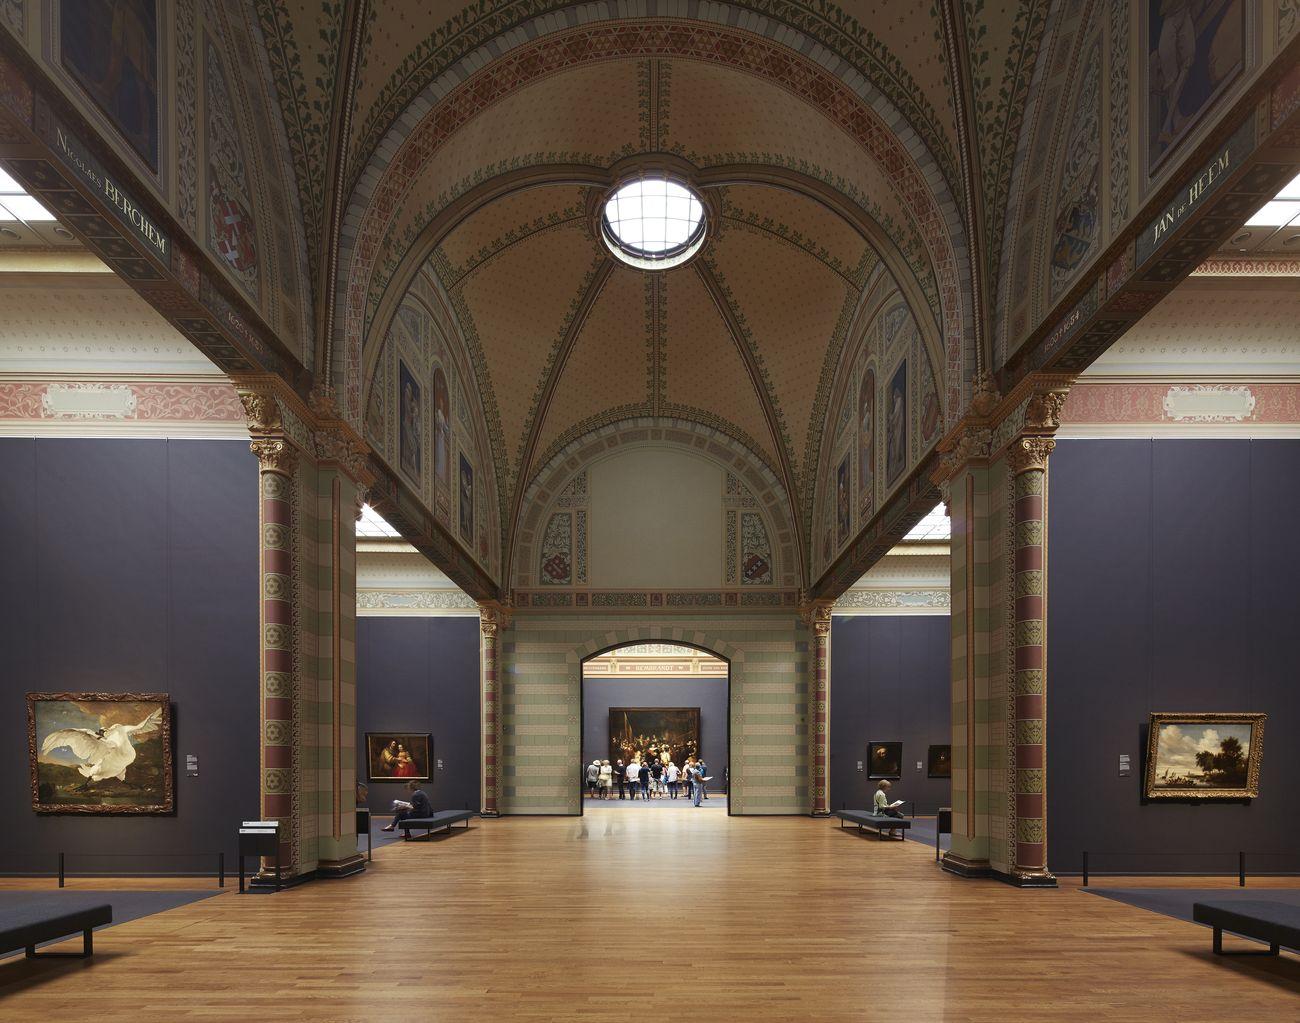 Eregalerij, Rijksmuseum, Amsterdam. Photo Erik Smits, 2015